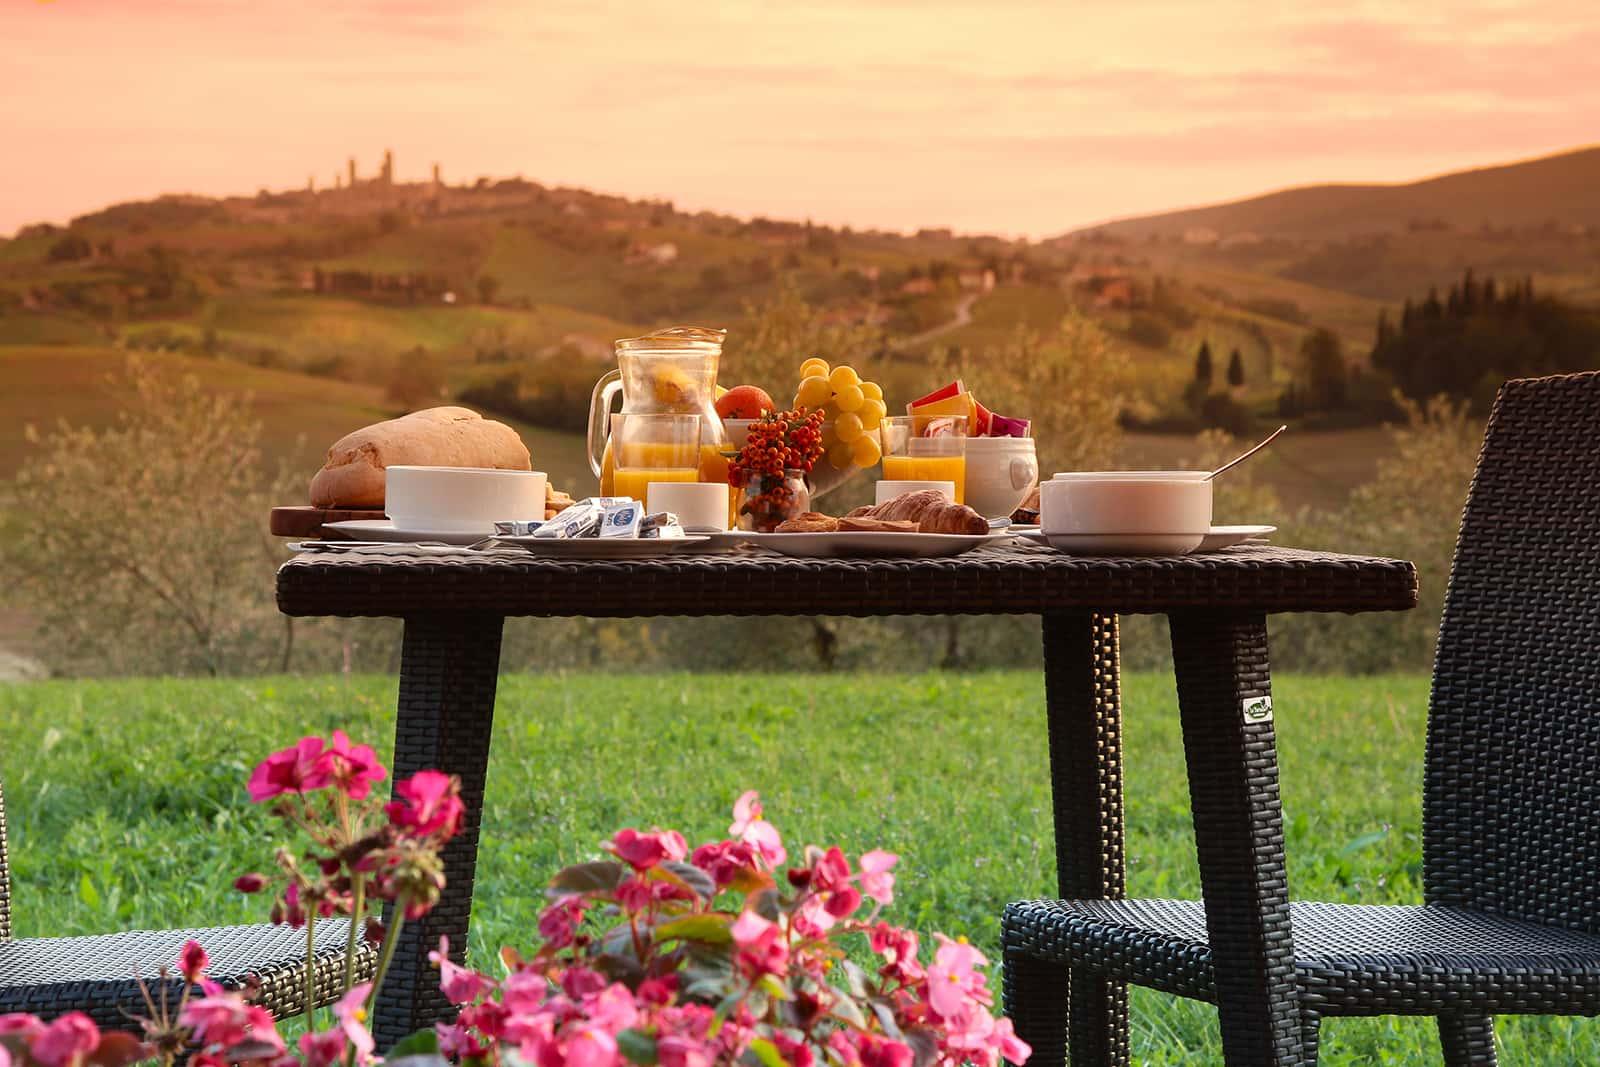 dimora-gallery-mormoraia-agriturismo-hotel-vacanza-bb-relax-casale-outdoor-12.jpg